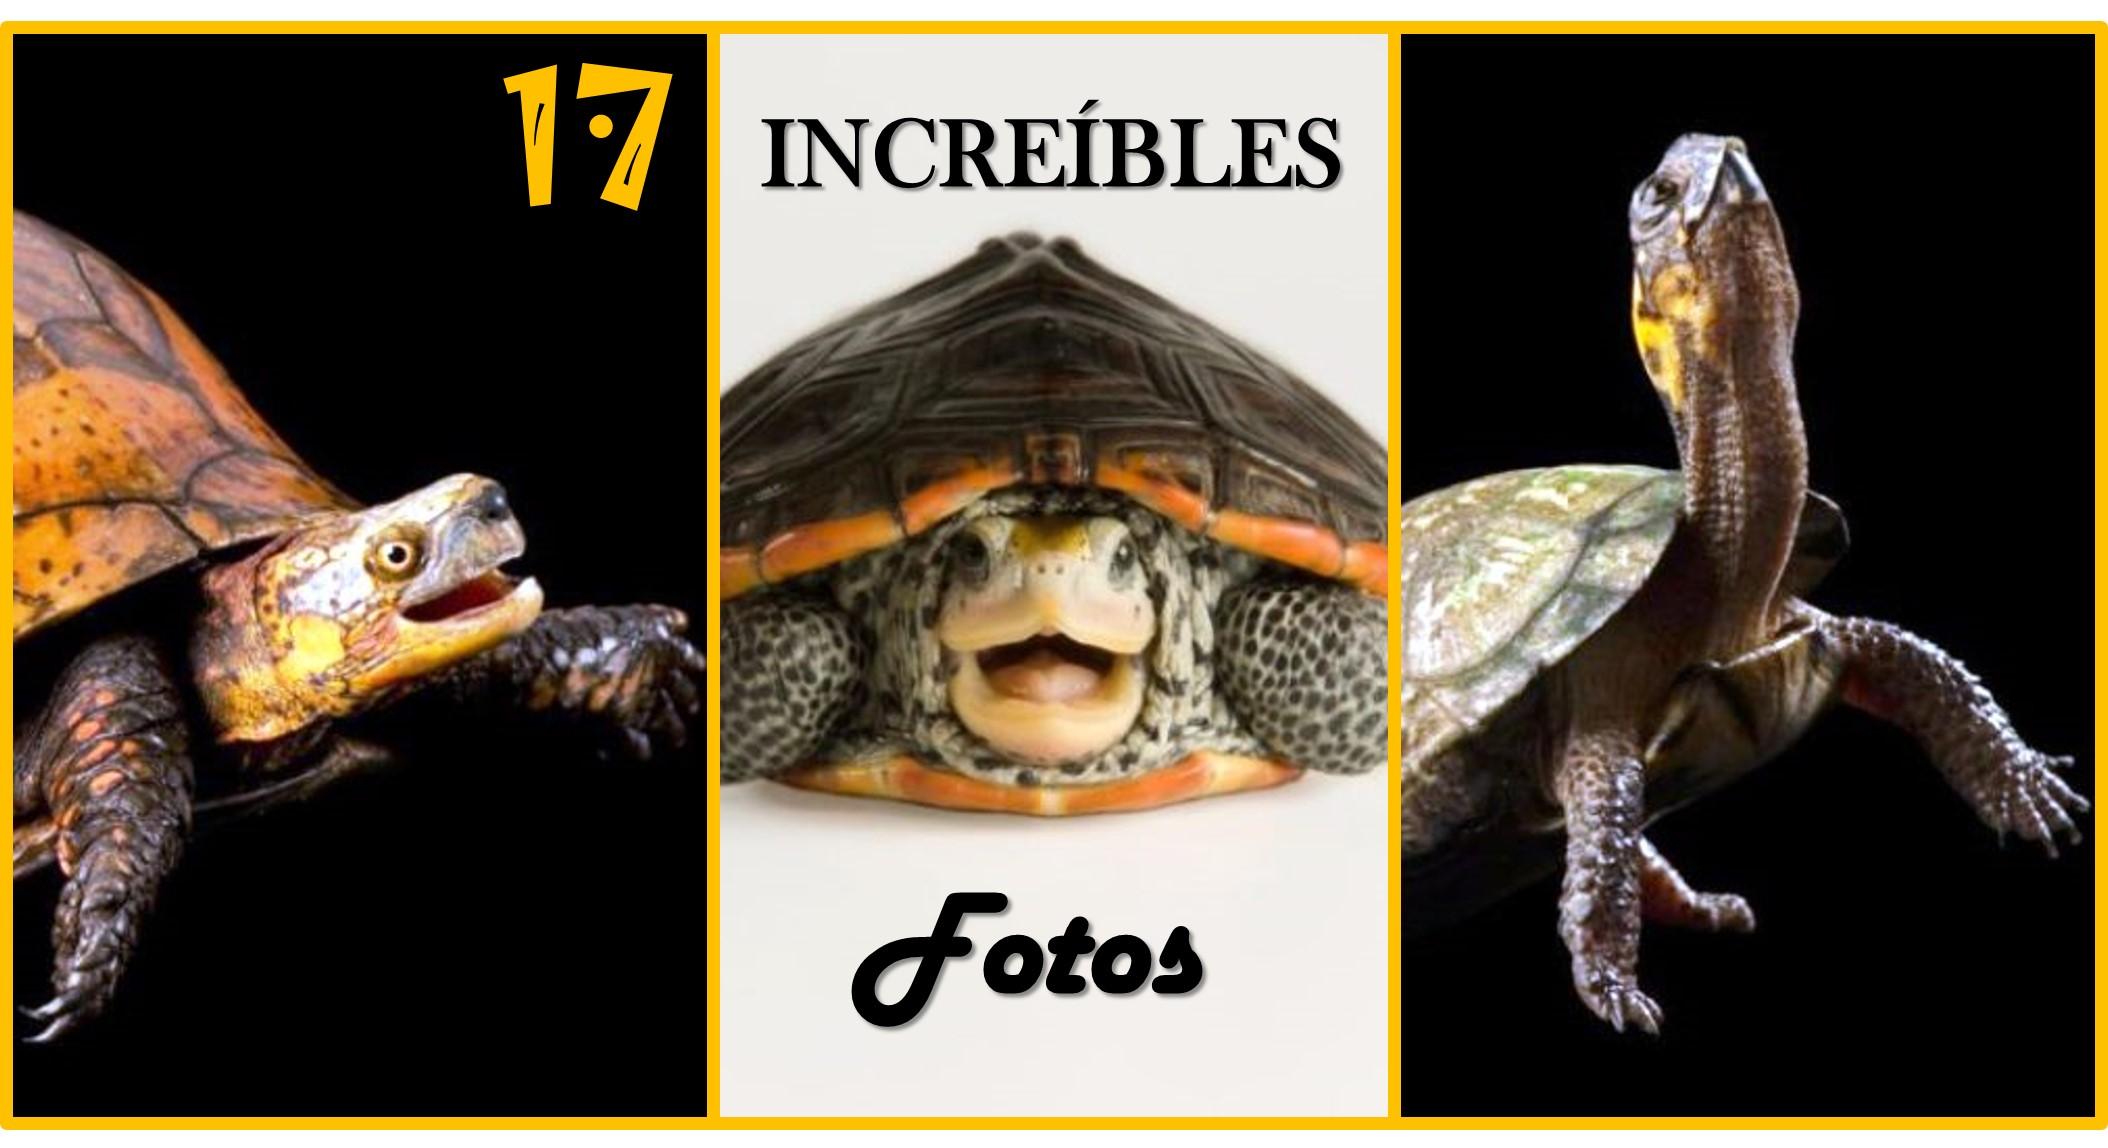 17-asombrosas-fotos-de-tortugas-en-peligro-